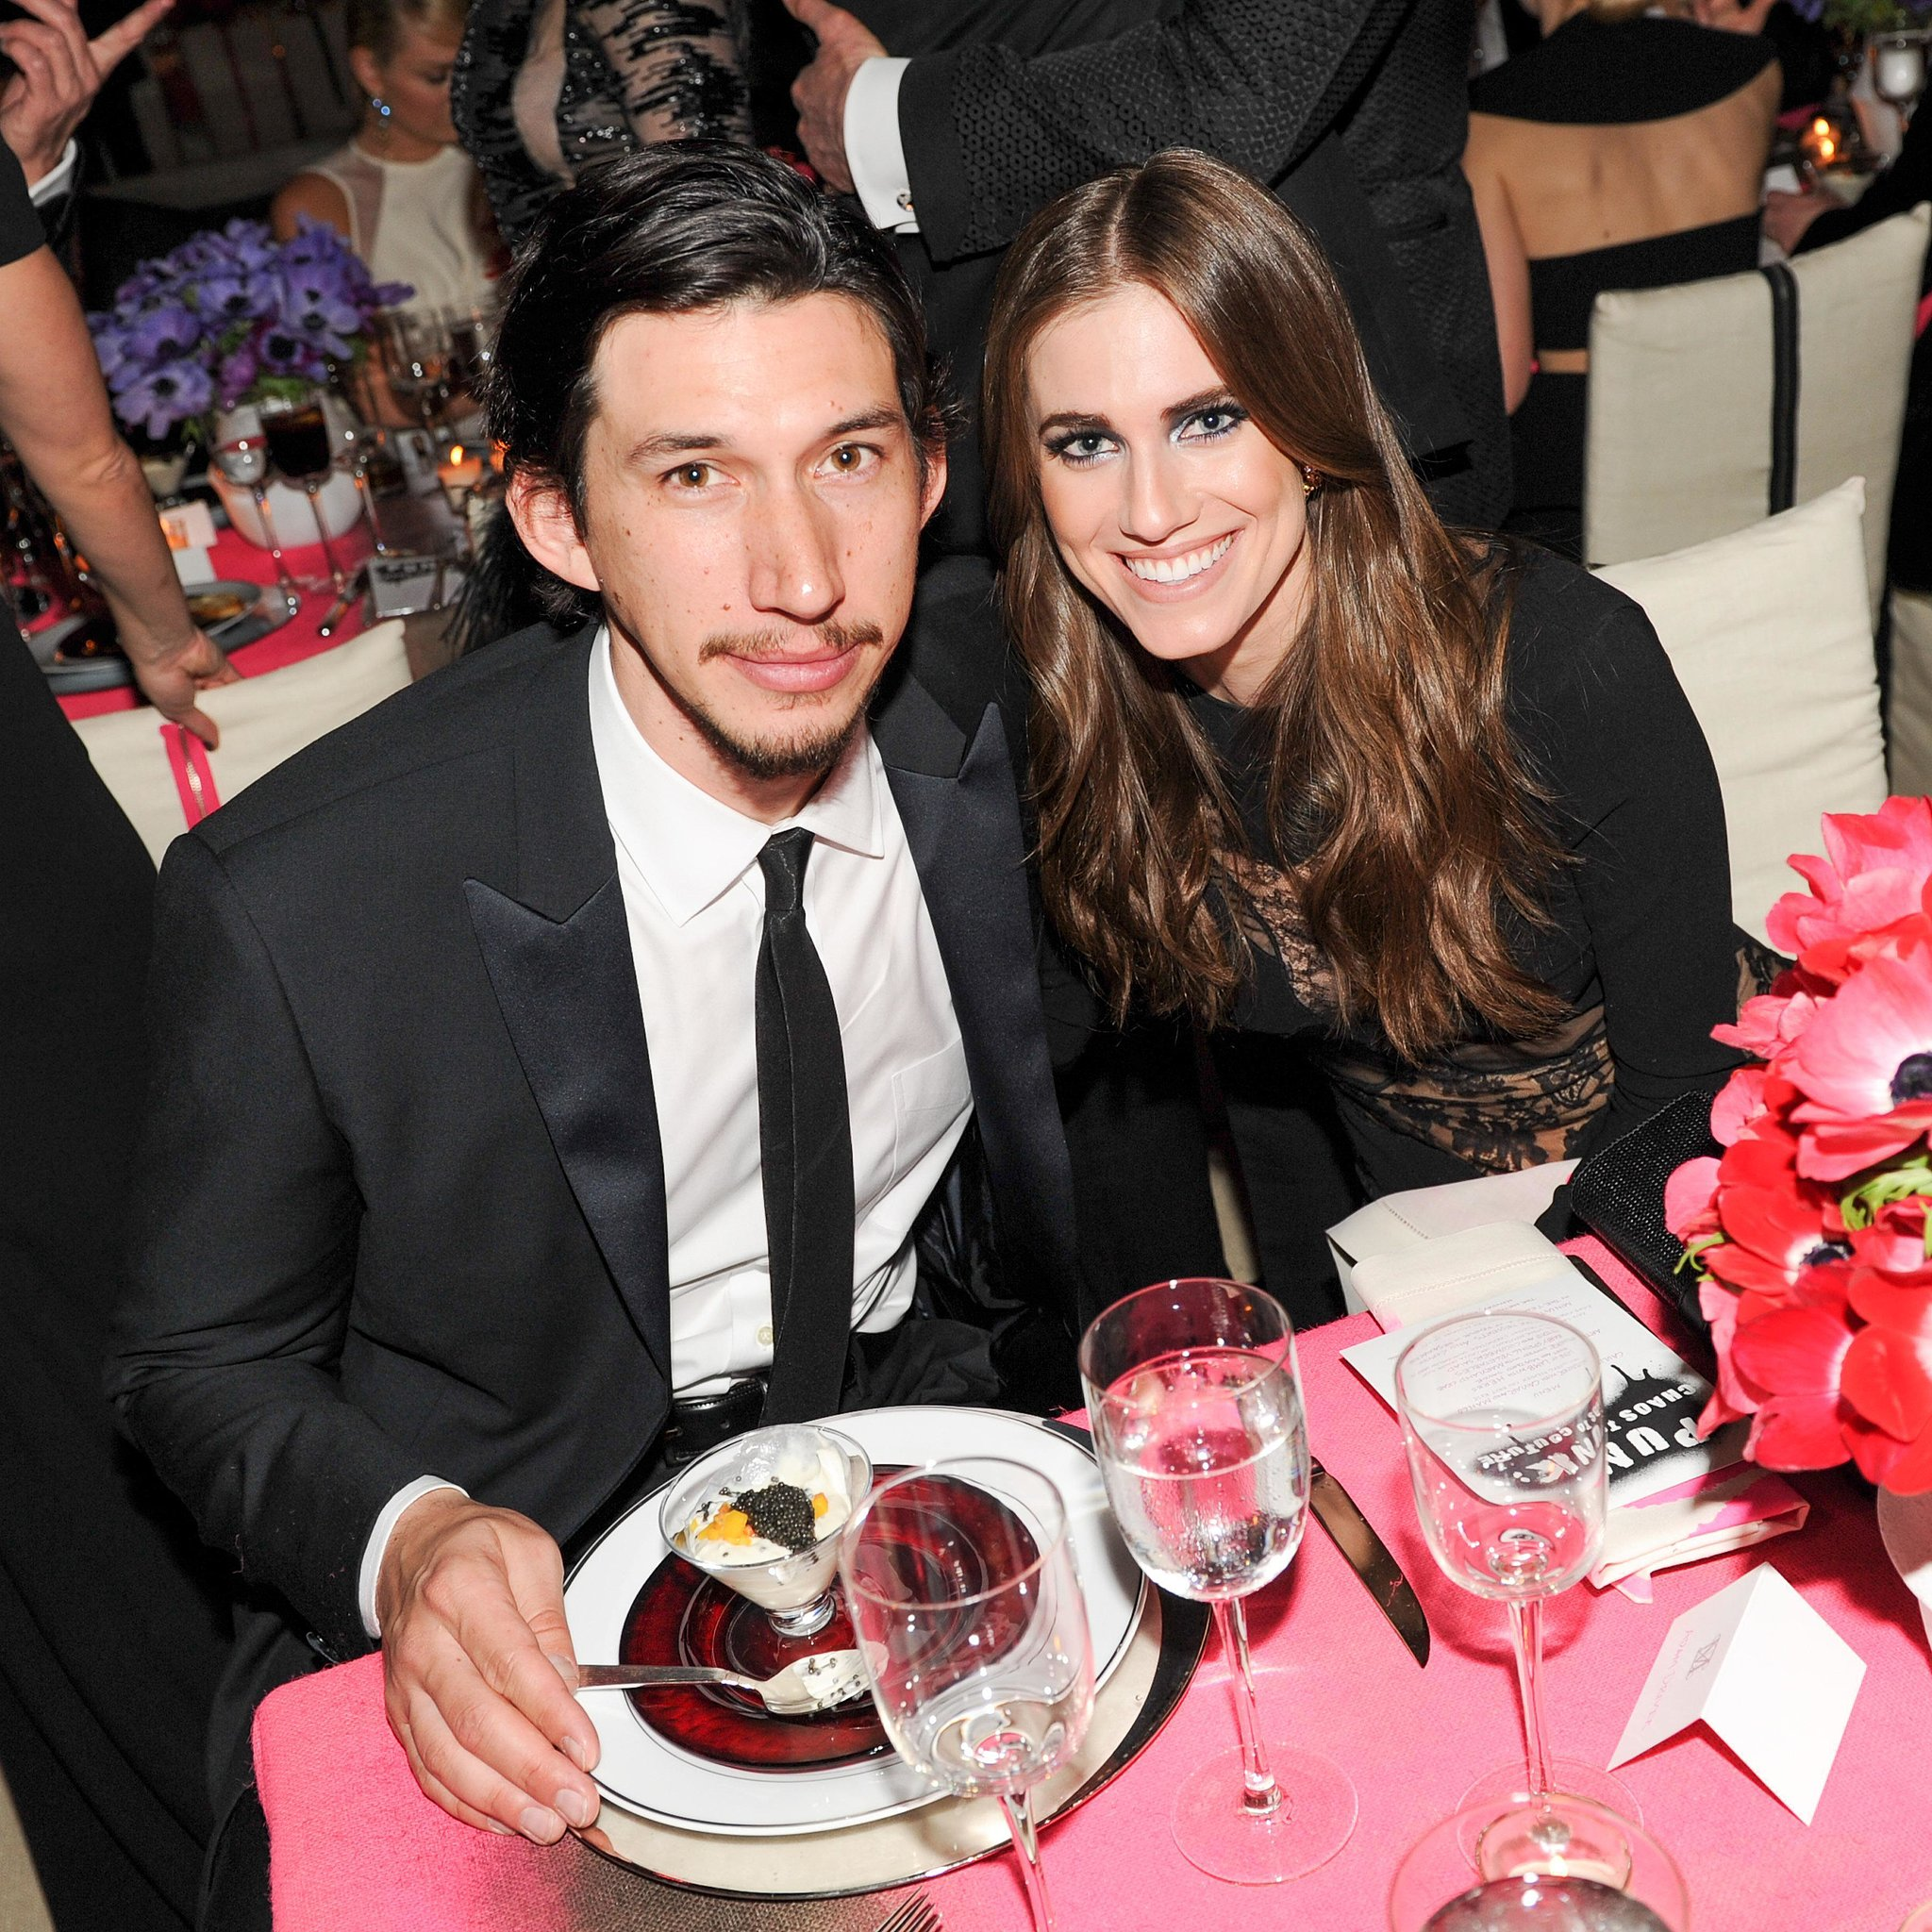 Allison Williams and Adam Driver had a Girls reunion inside the Met Gala. Source: Billy Farrell/BFANYC.com